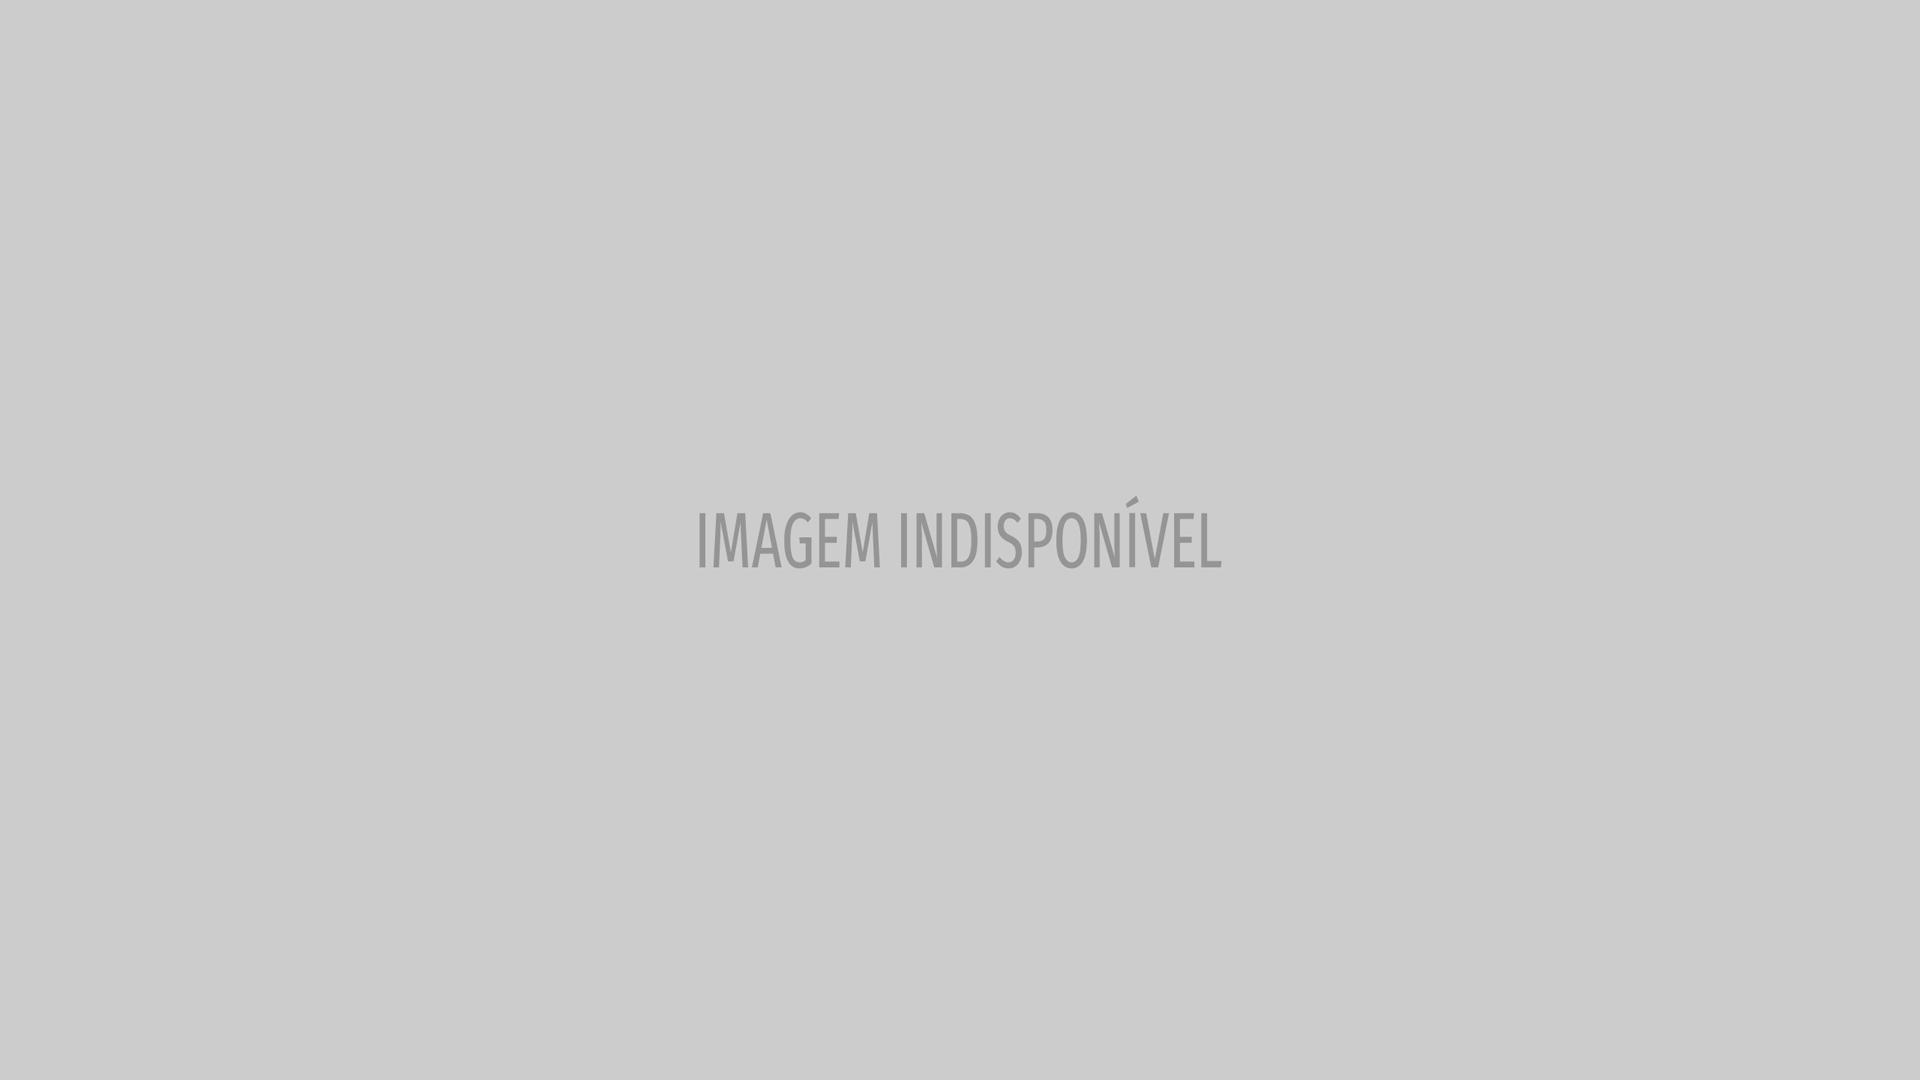 Antônia Fontenelle receberá herança de Marcos Paulo: 'Vitória'